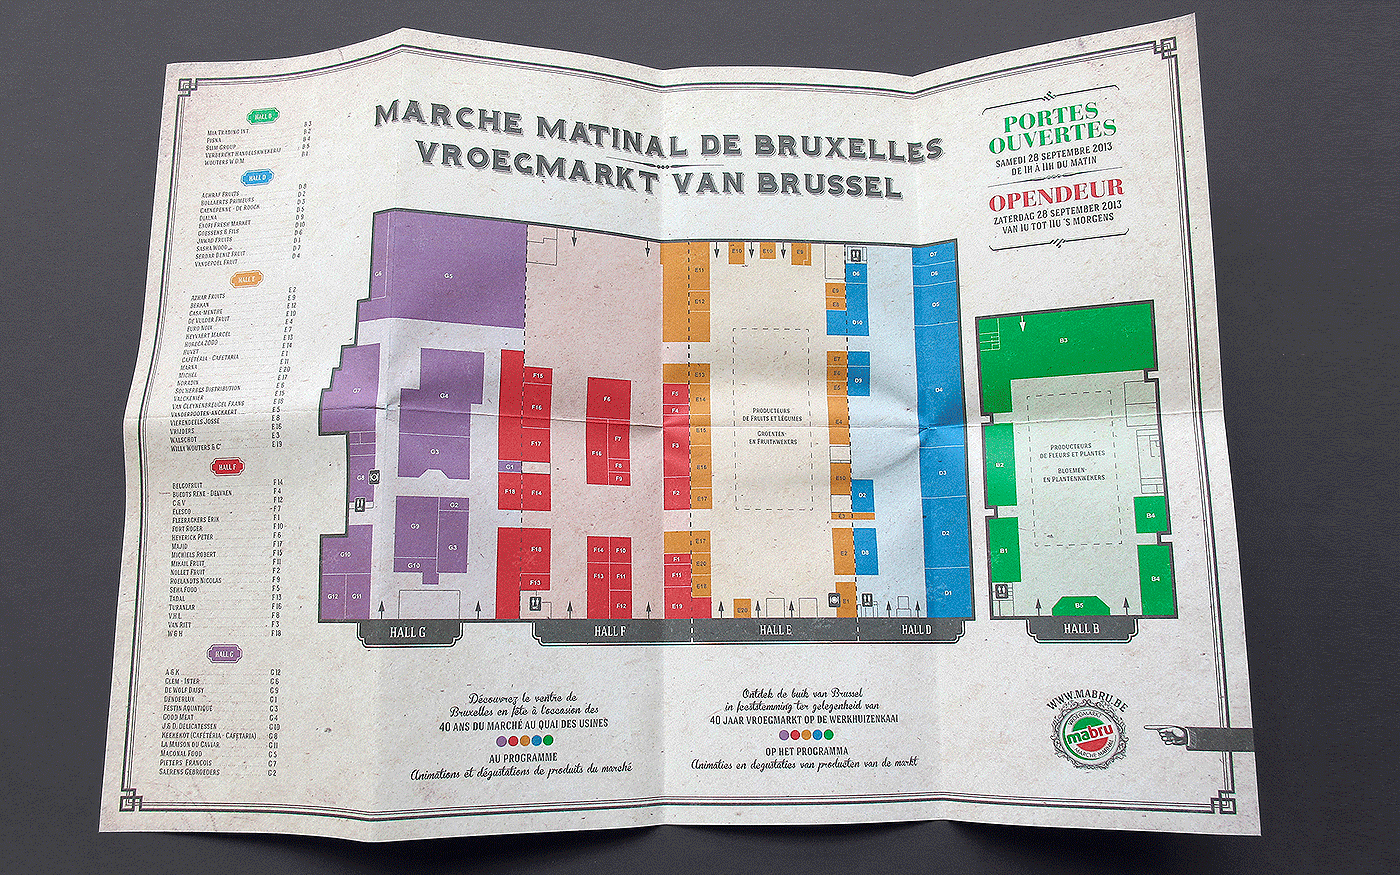 Mabru anniversary open door map Invitation Event evenement marche Plan brussels bruxelles